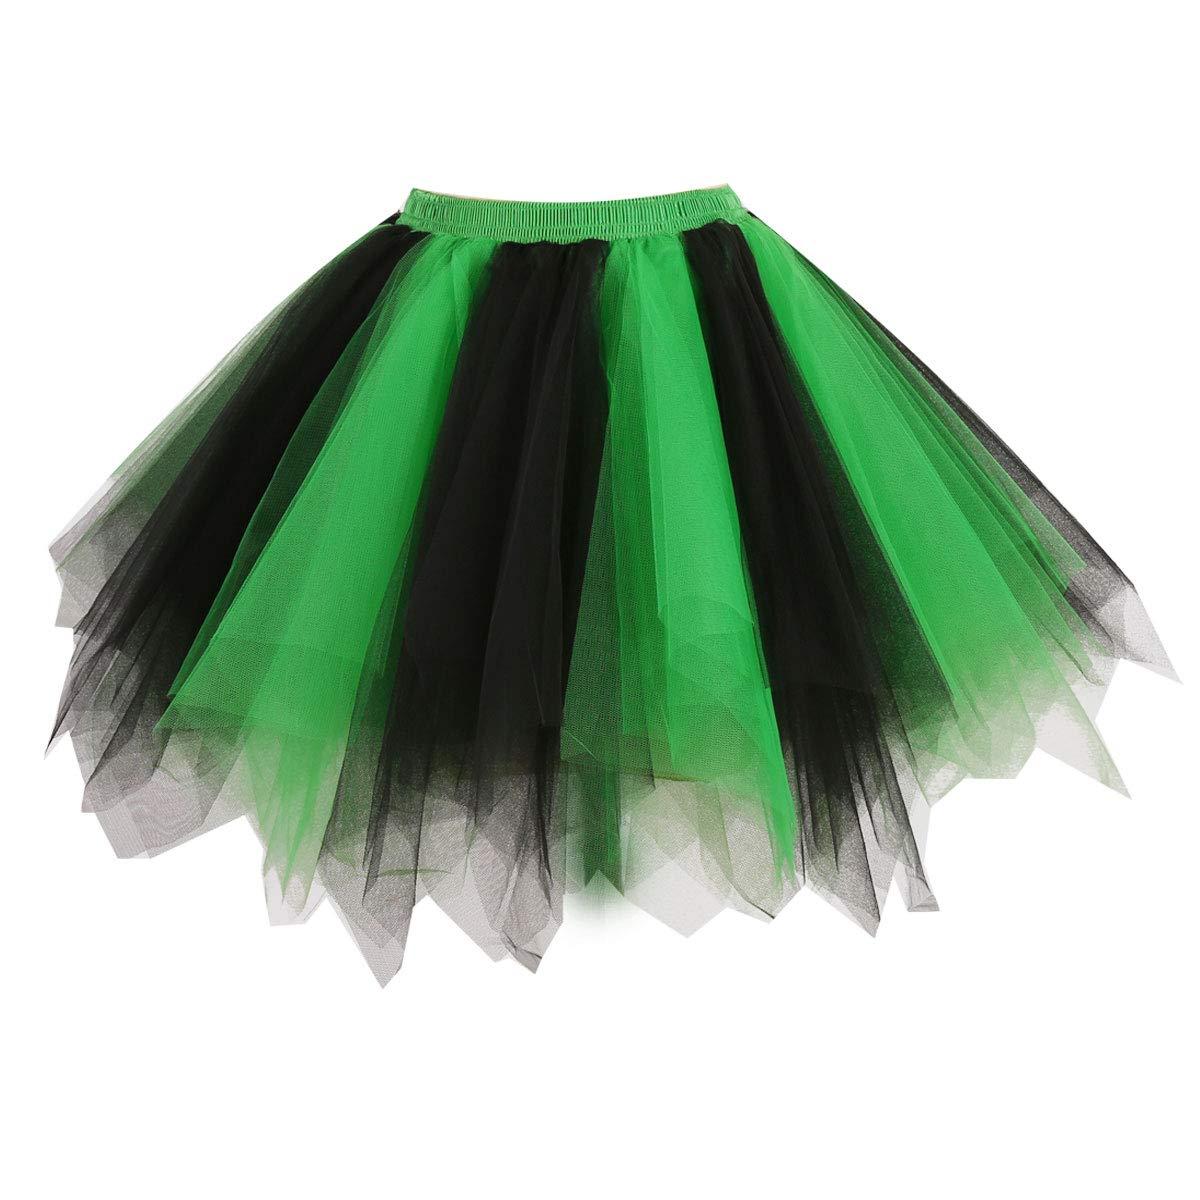 b88dac3b0700df GirstunmBrand Damen 50er Vintage Tüllrock Petticoat Mehrfarbig Bubble  Tanzkleid Rock Röcke Damen